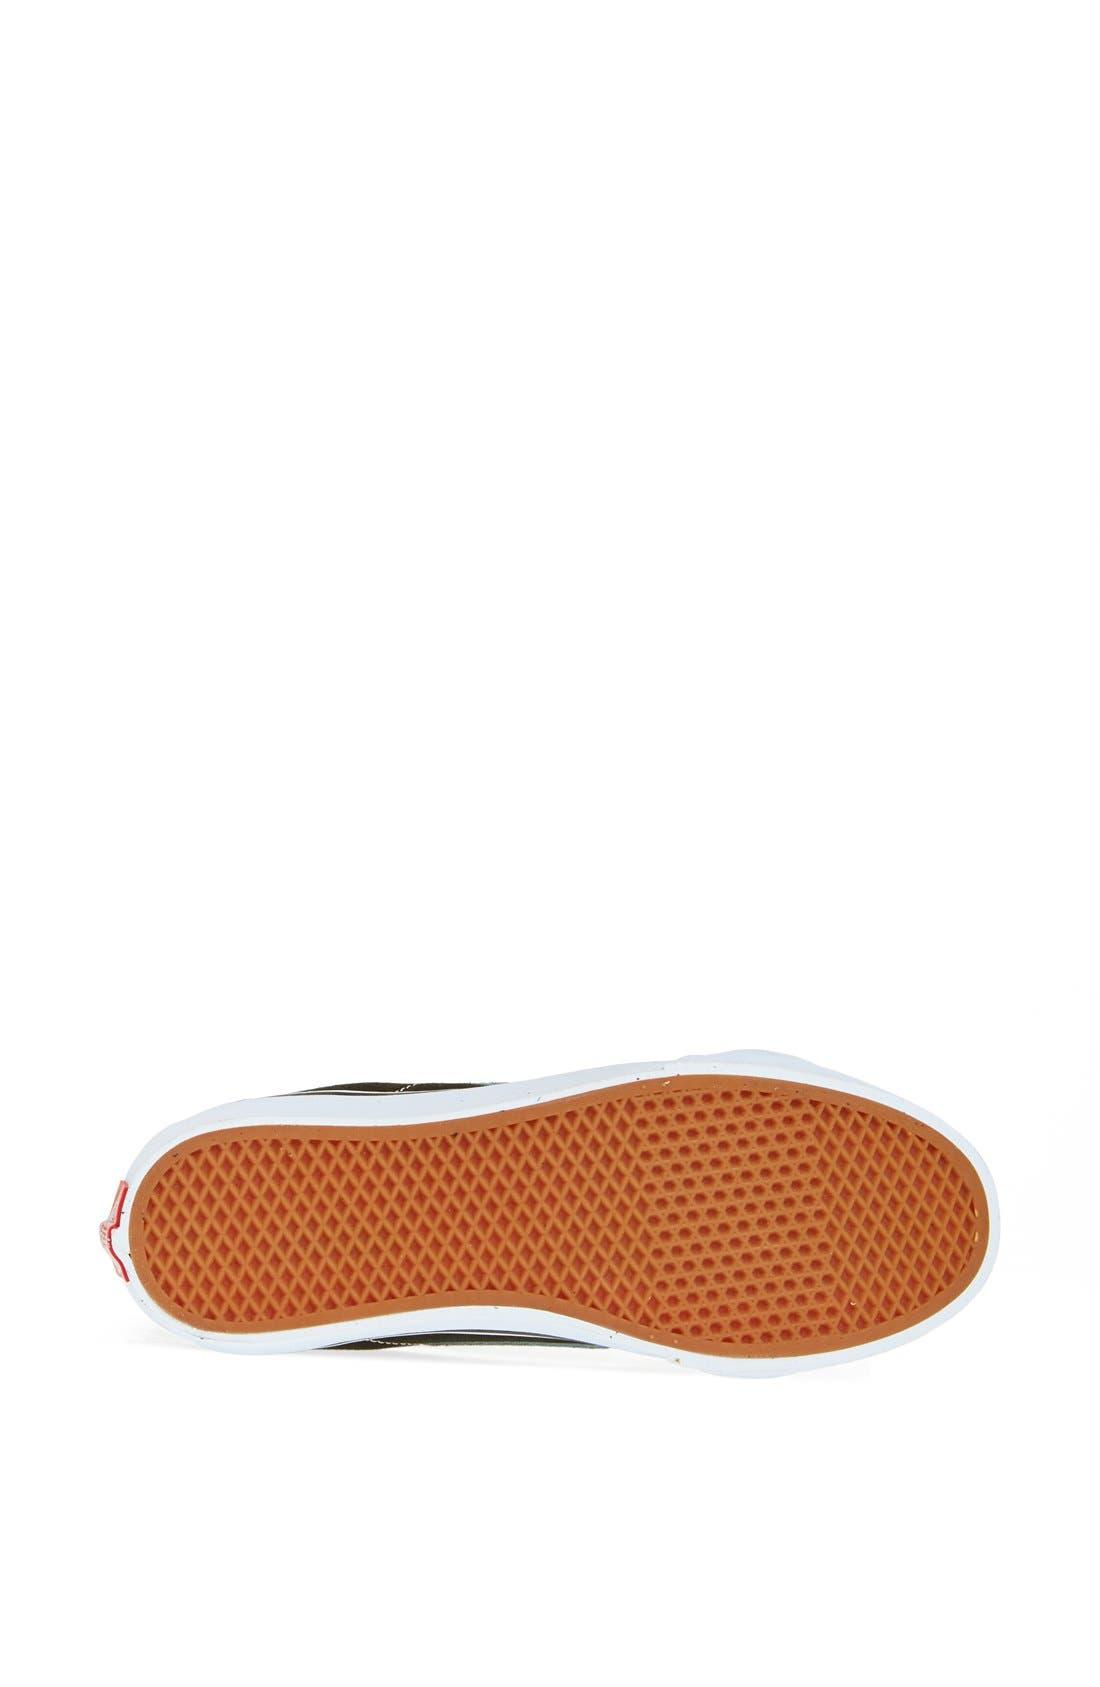 VANS, Sk8-Hi Slim High Top Sneaker, Alternate thumbnail 6, color, BLACK TRUE WHITE